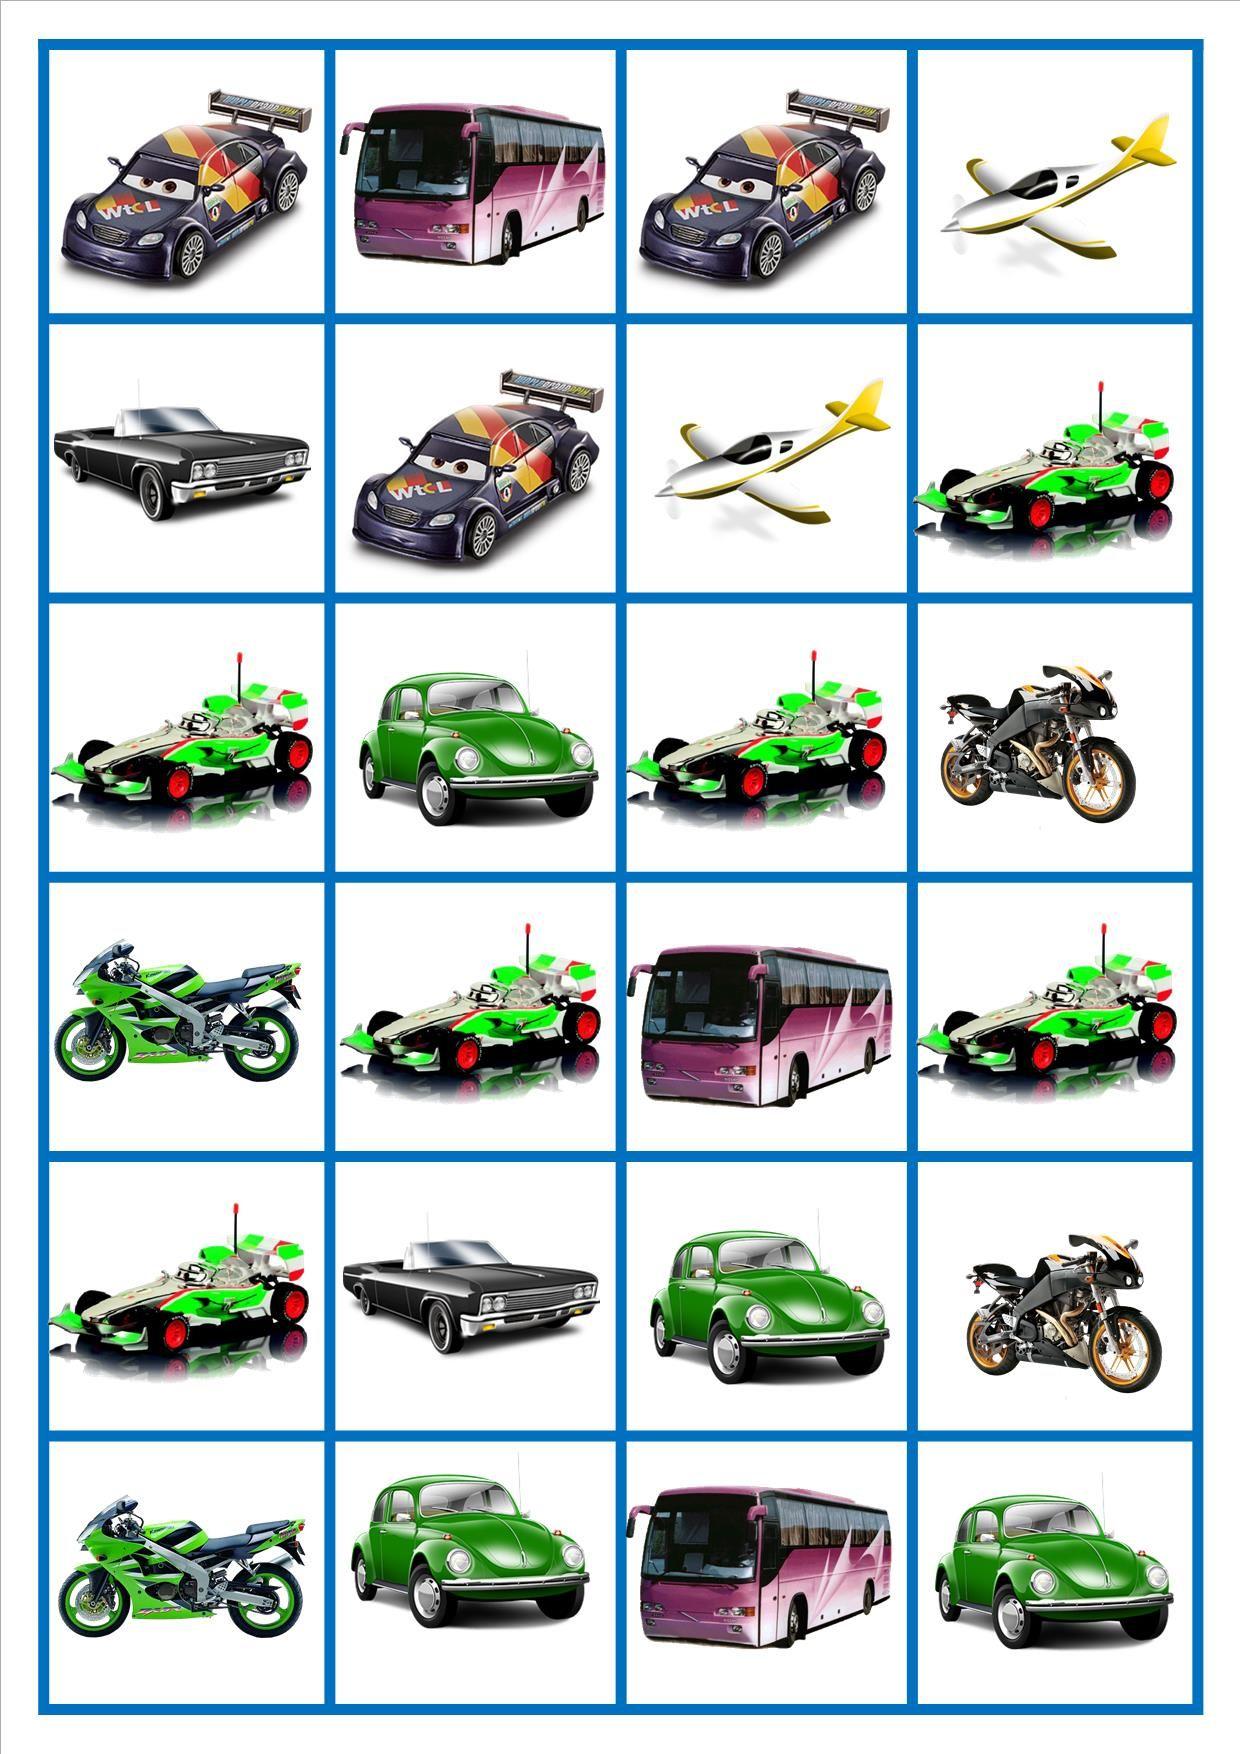 Domino Auto S Vervoer Thema Spelborden